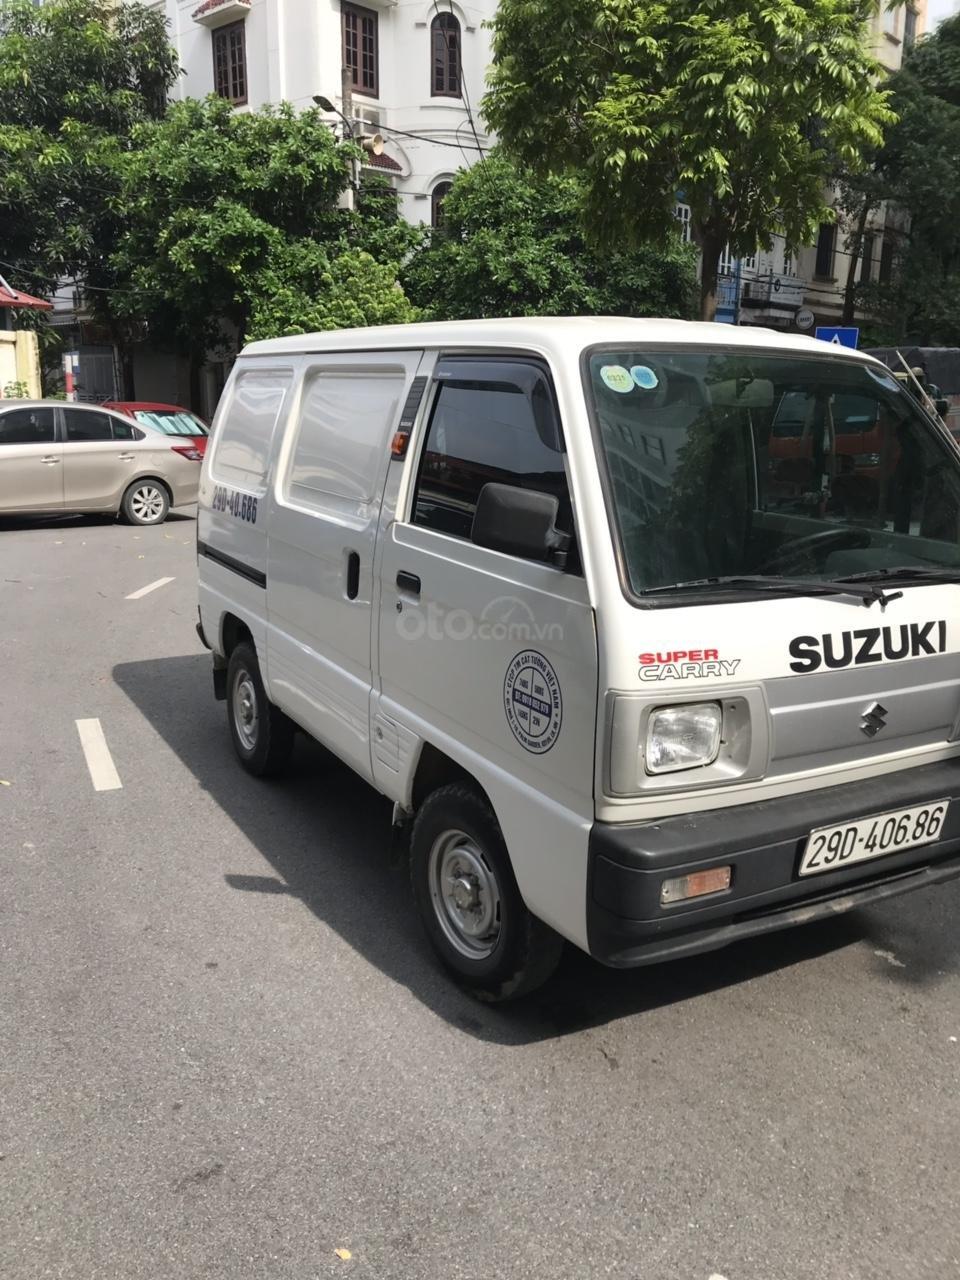 Hot Suzuki tải van lướt 2018 (2)